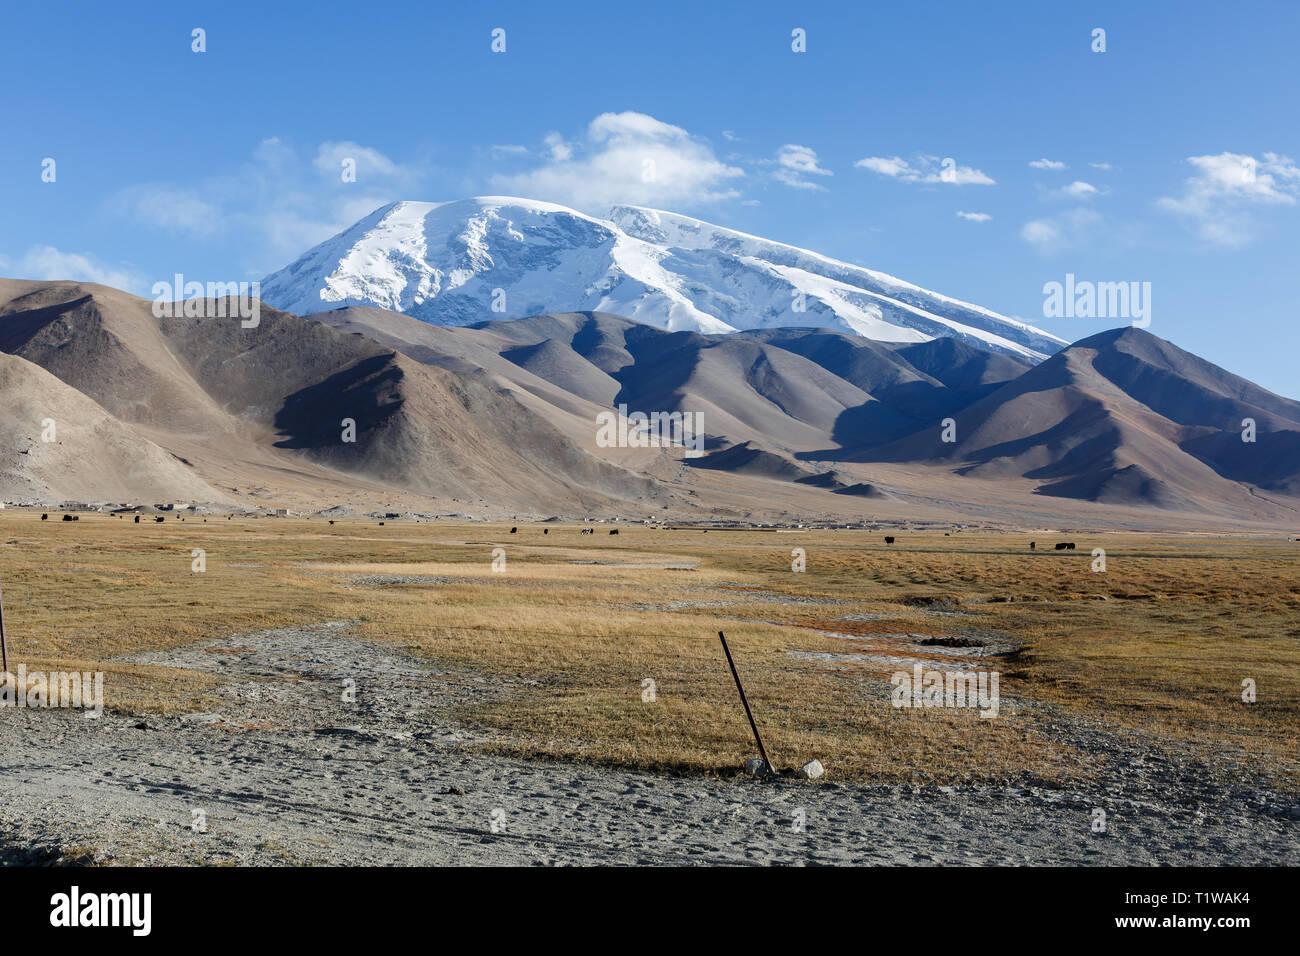 Muztagh Ata Mountain, captured near Lake Karakul (Karakorum Highway, Xinjiang, China) - Stock Image